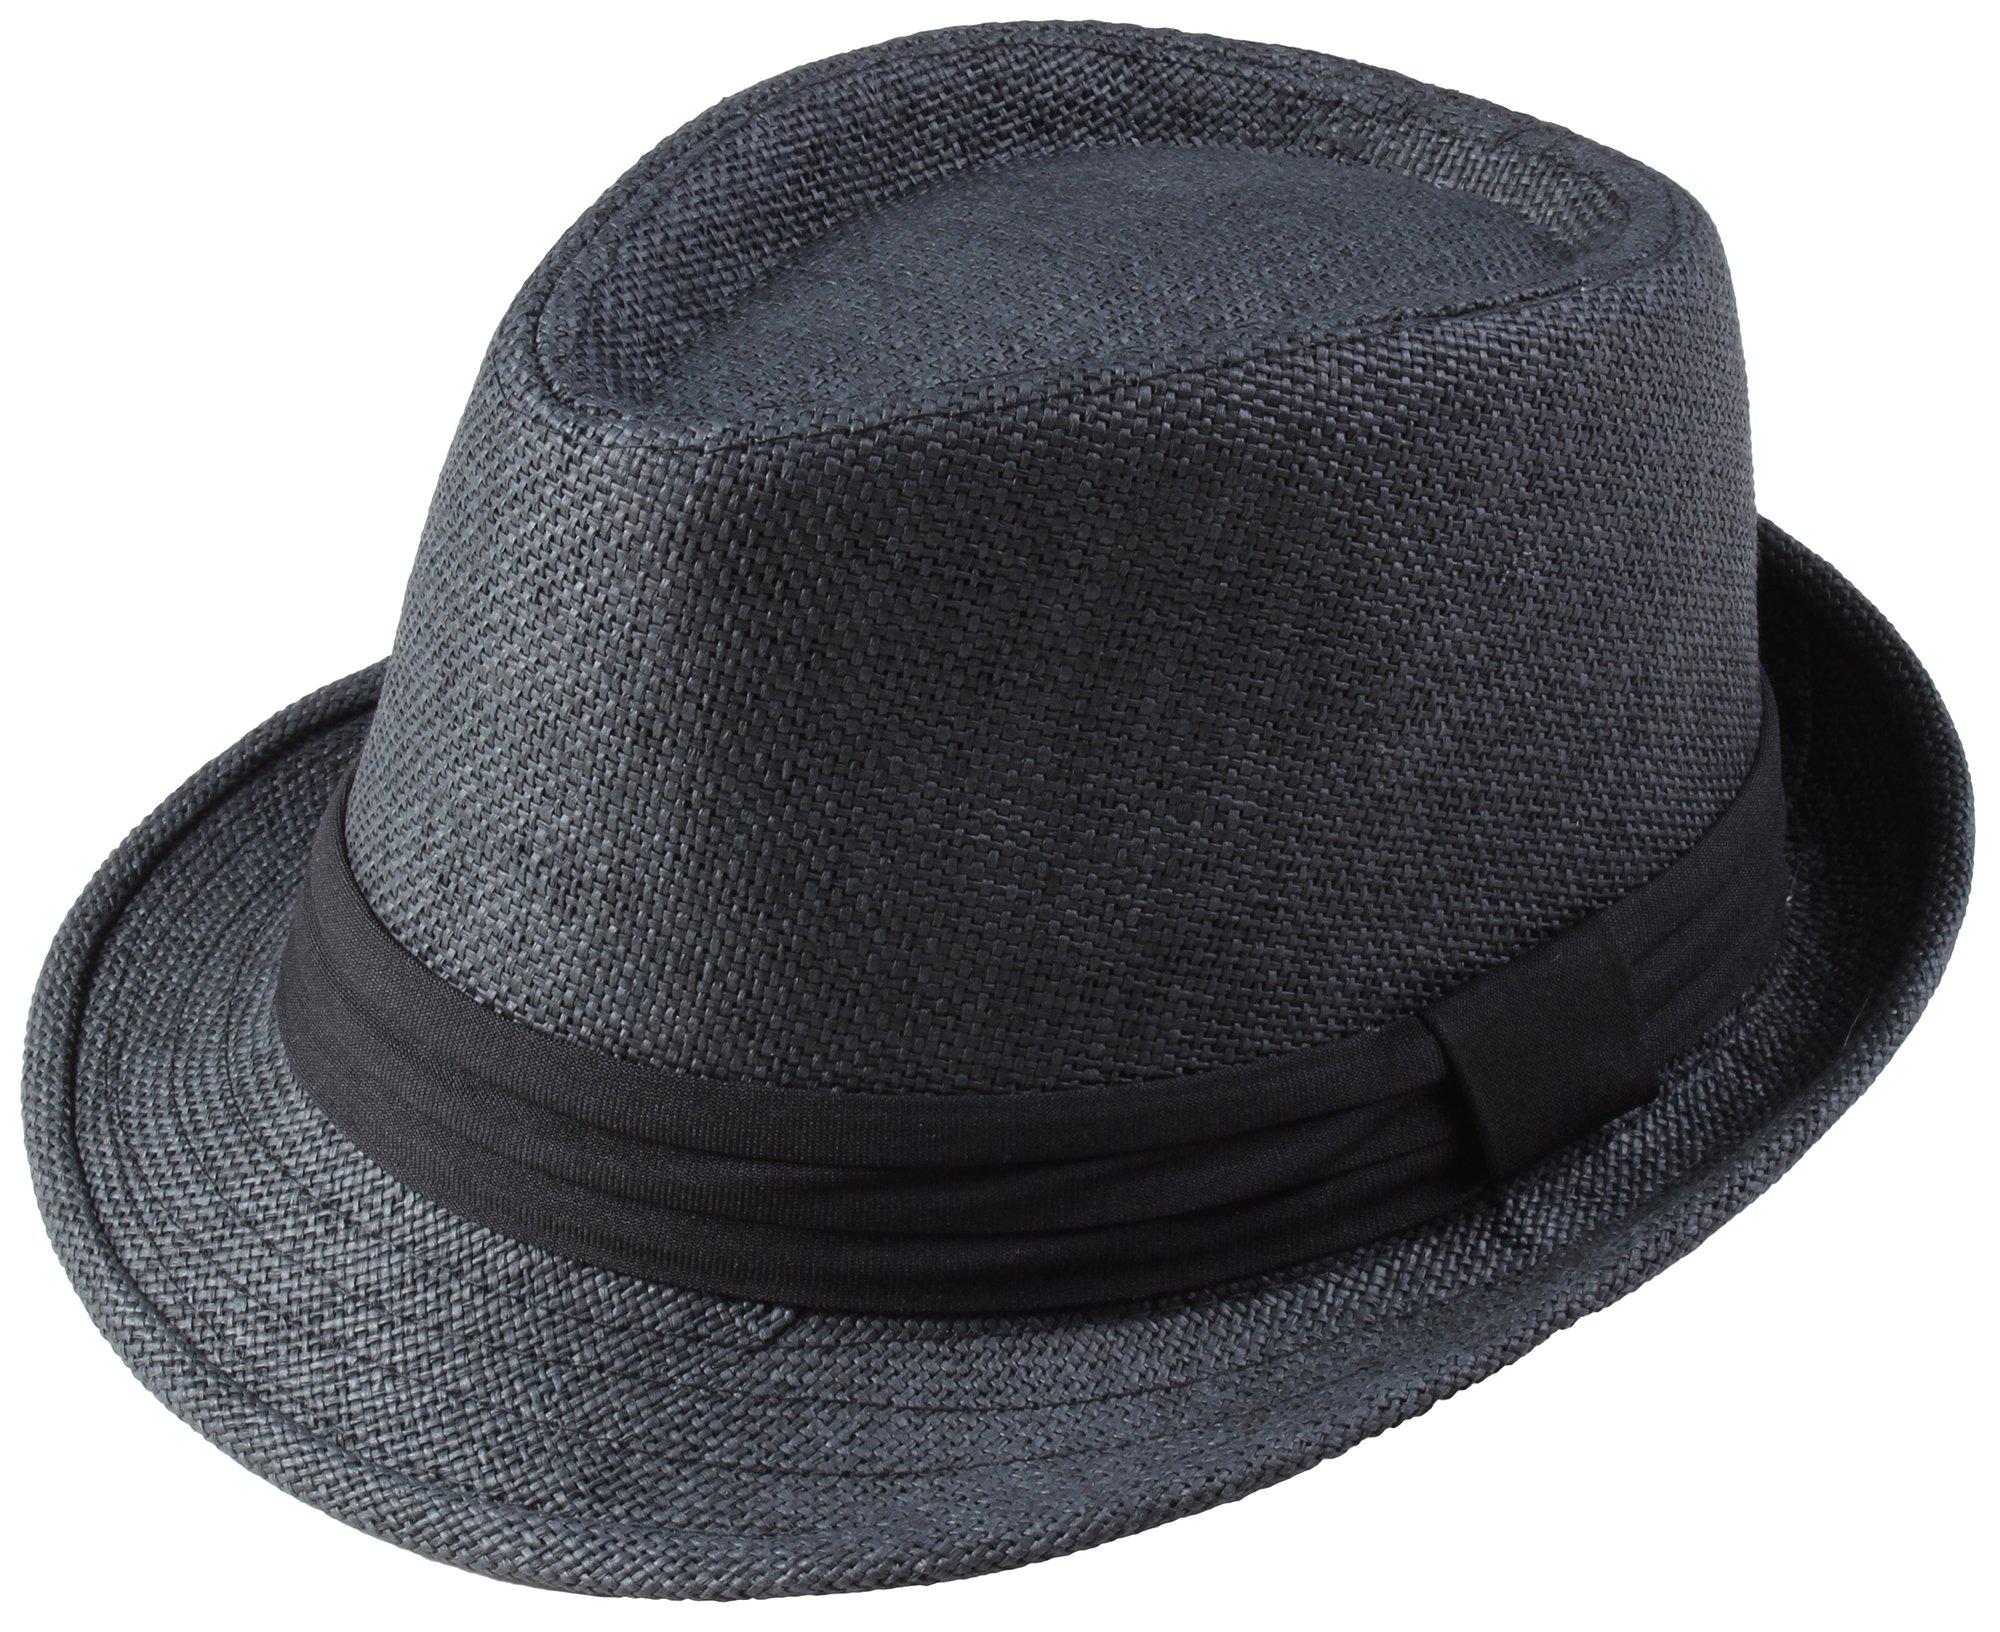 Classic Fedra Unisex Woven Hat Summer w/Stylish Band - A